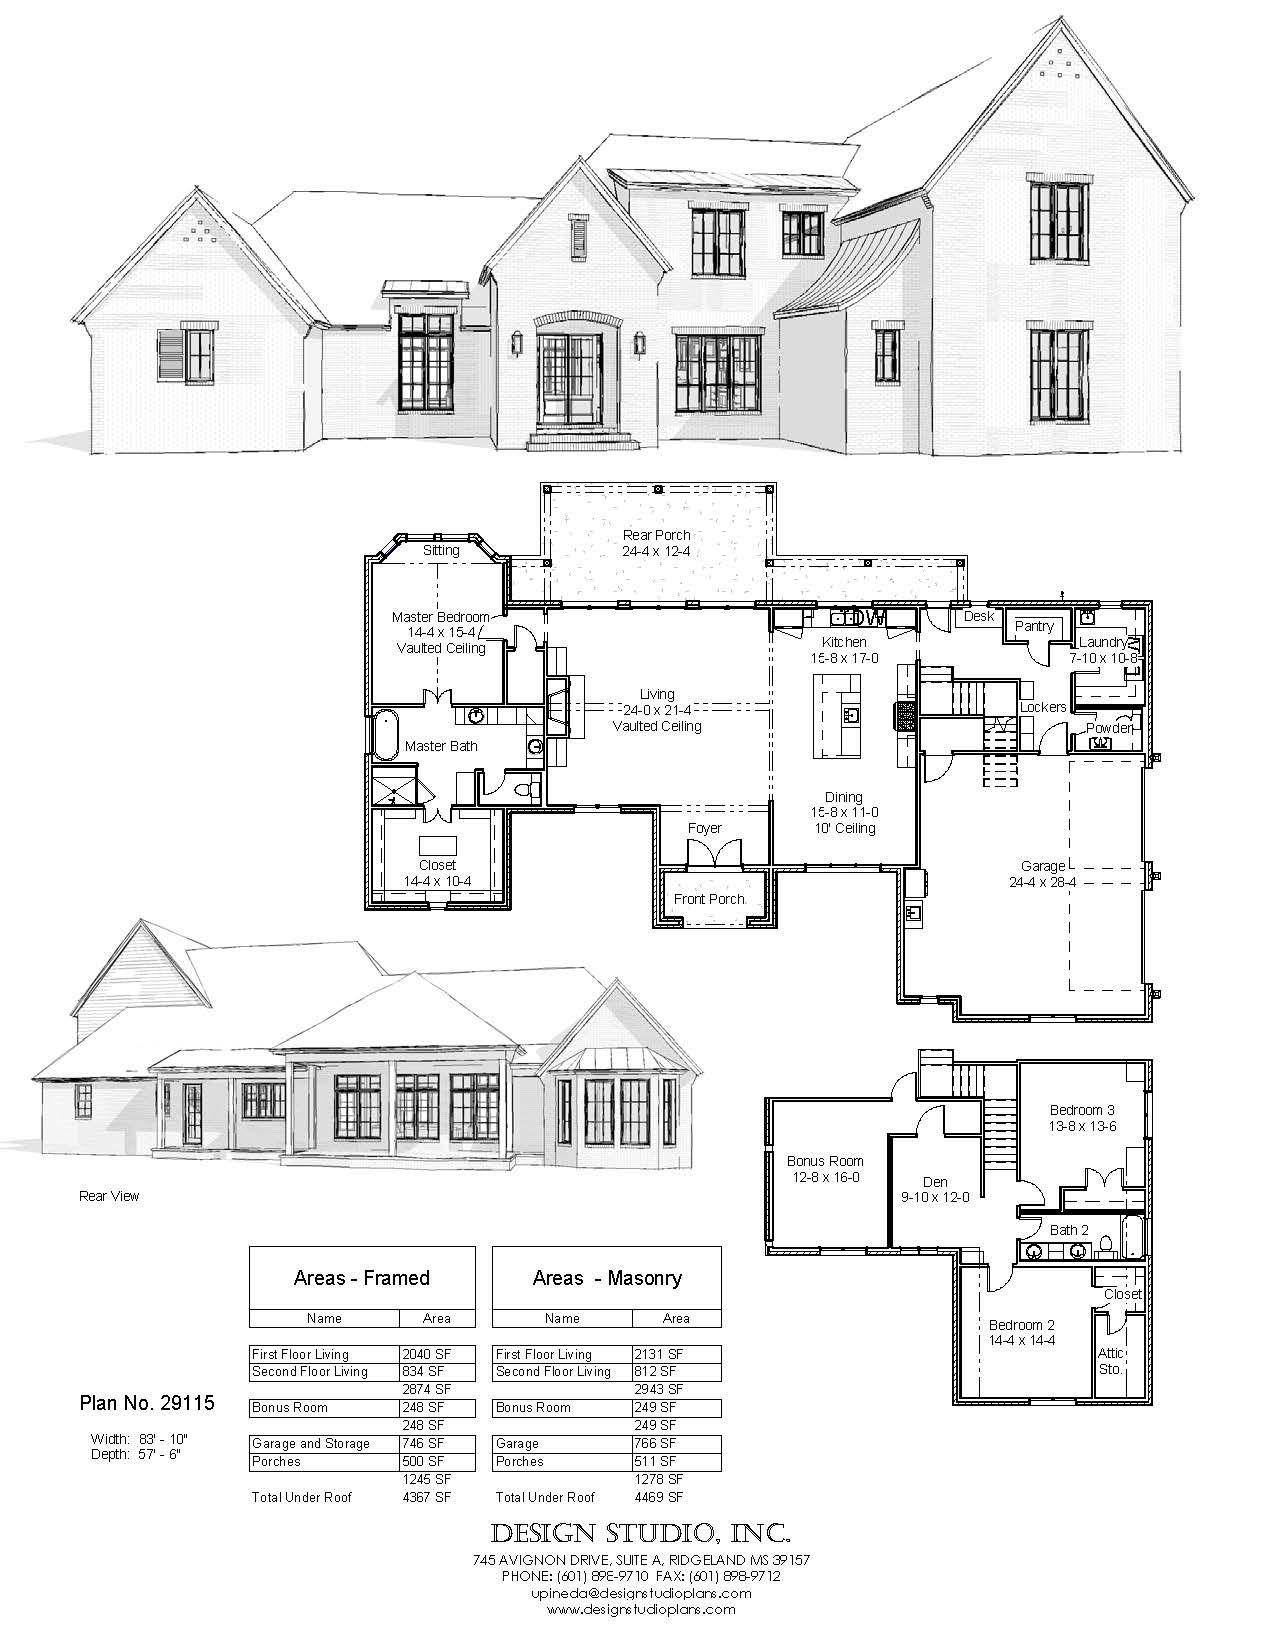 Plan 29115 Design Studio Family House Plans House Blueprints 5 Bedroom House Plans